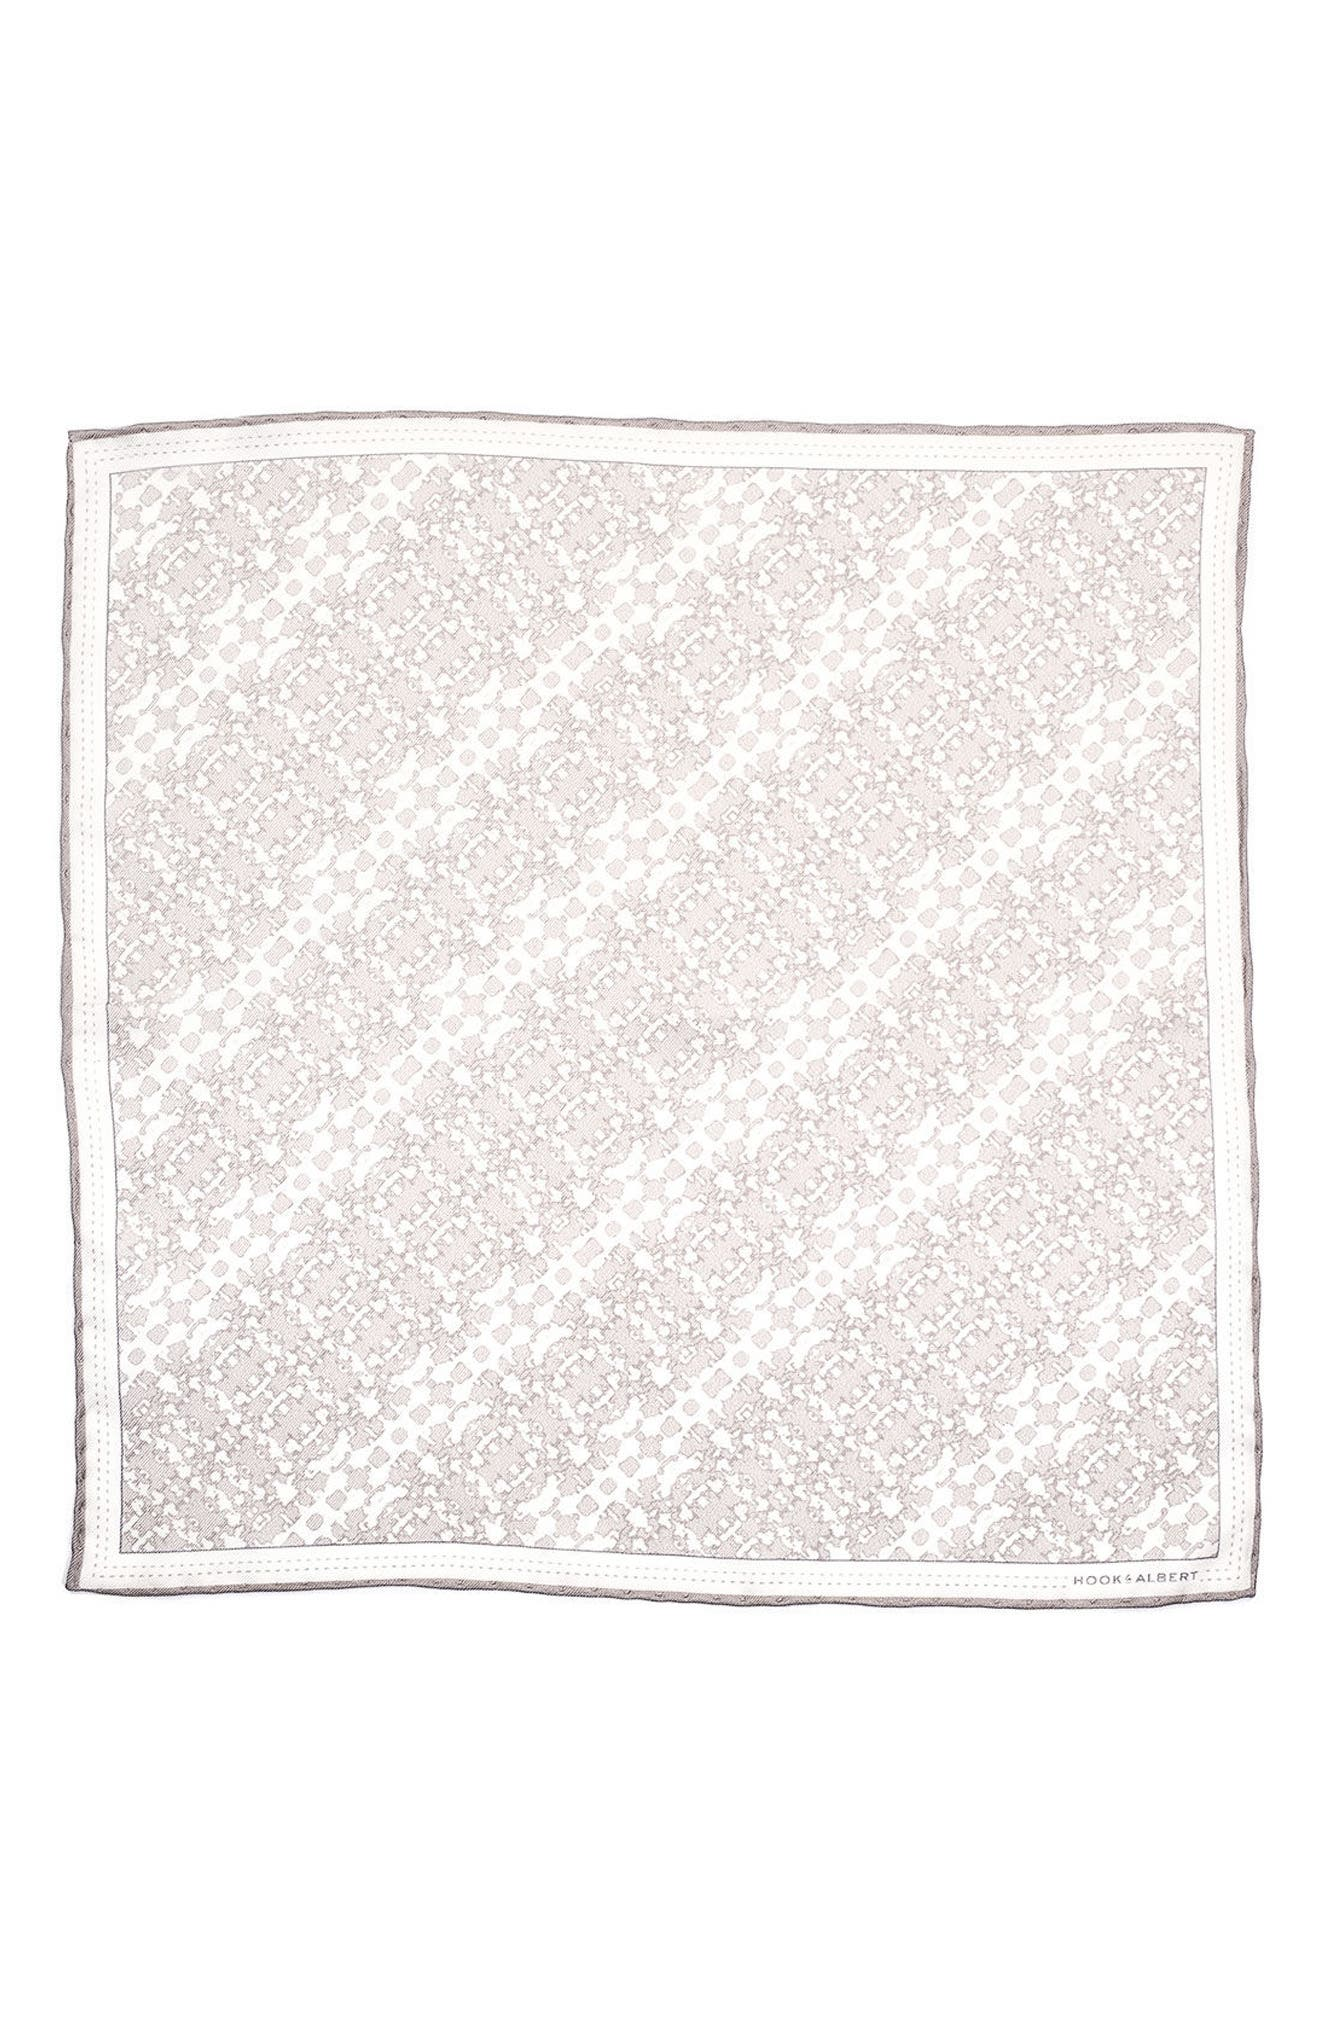 Alternate Image 2  - hook + ALBERT Batik Patterned Silk Pocket Square